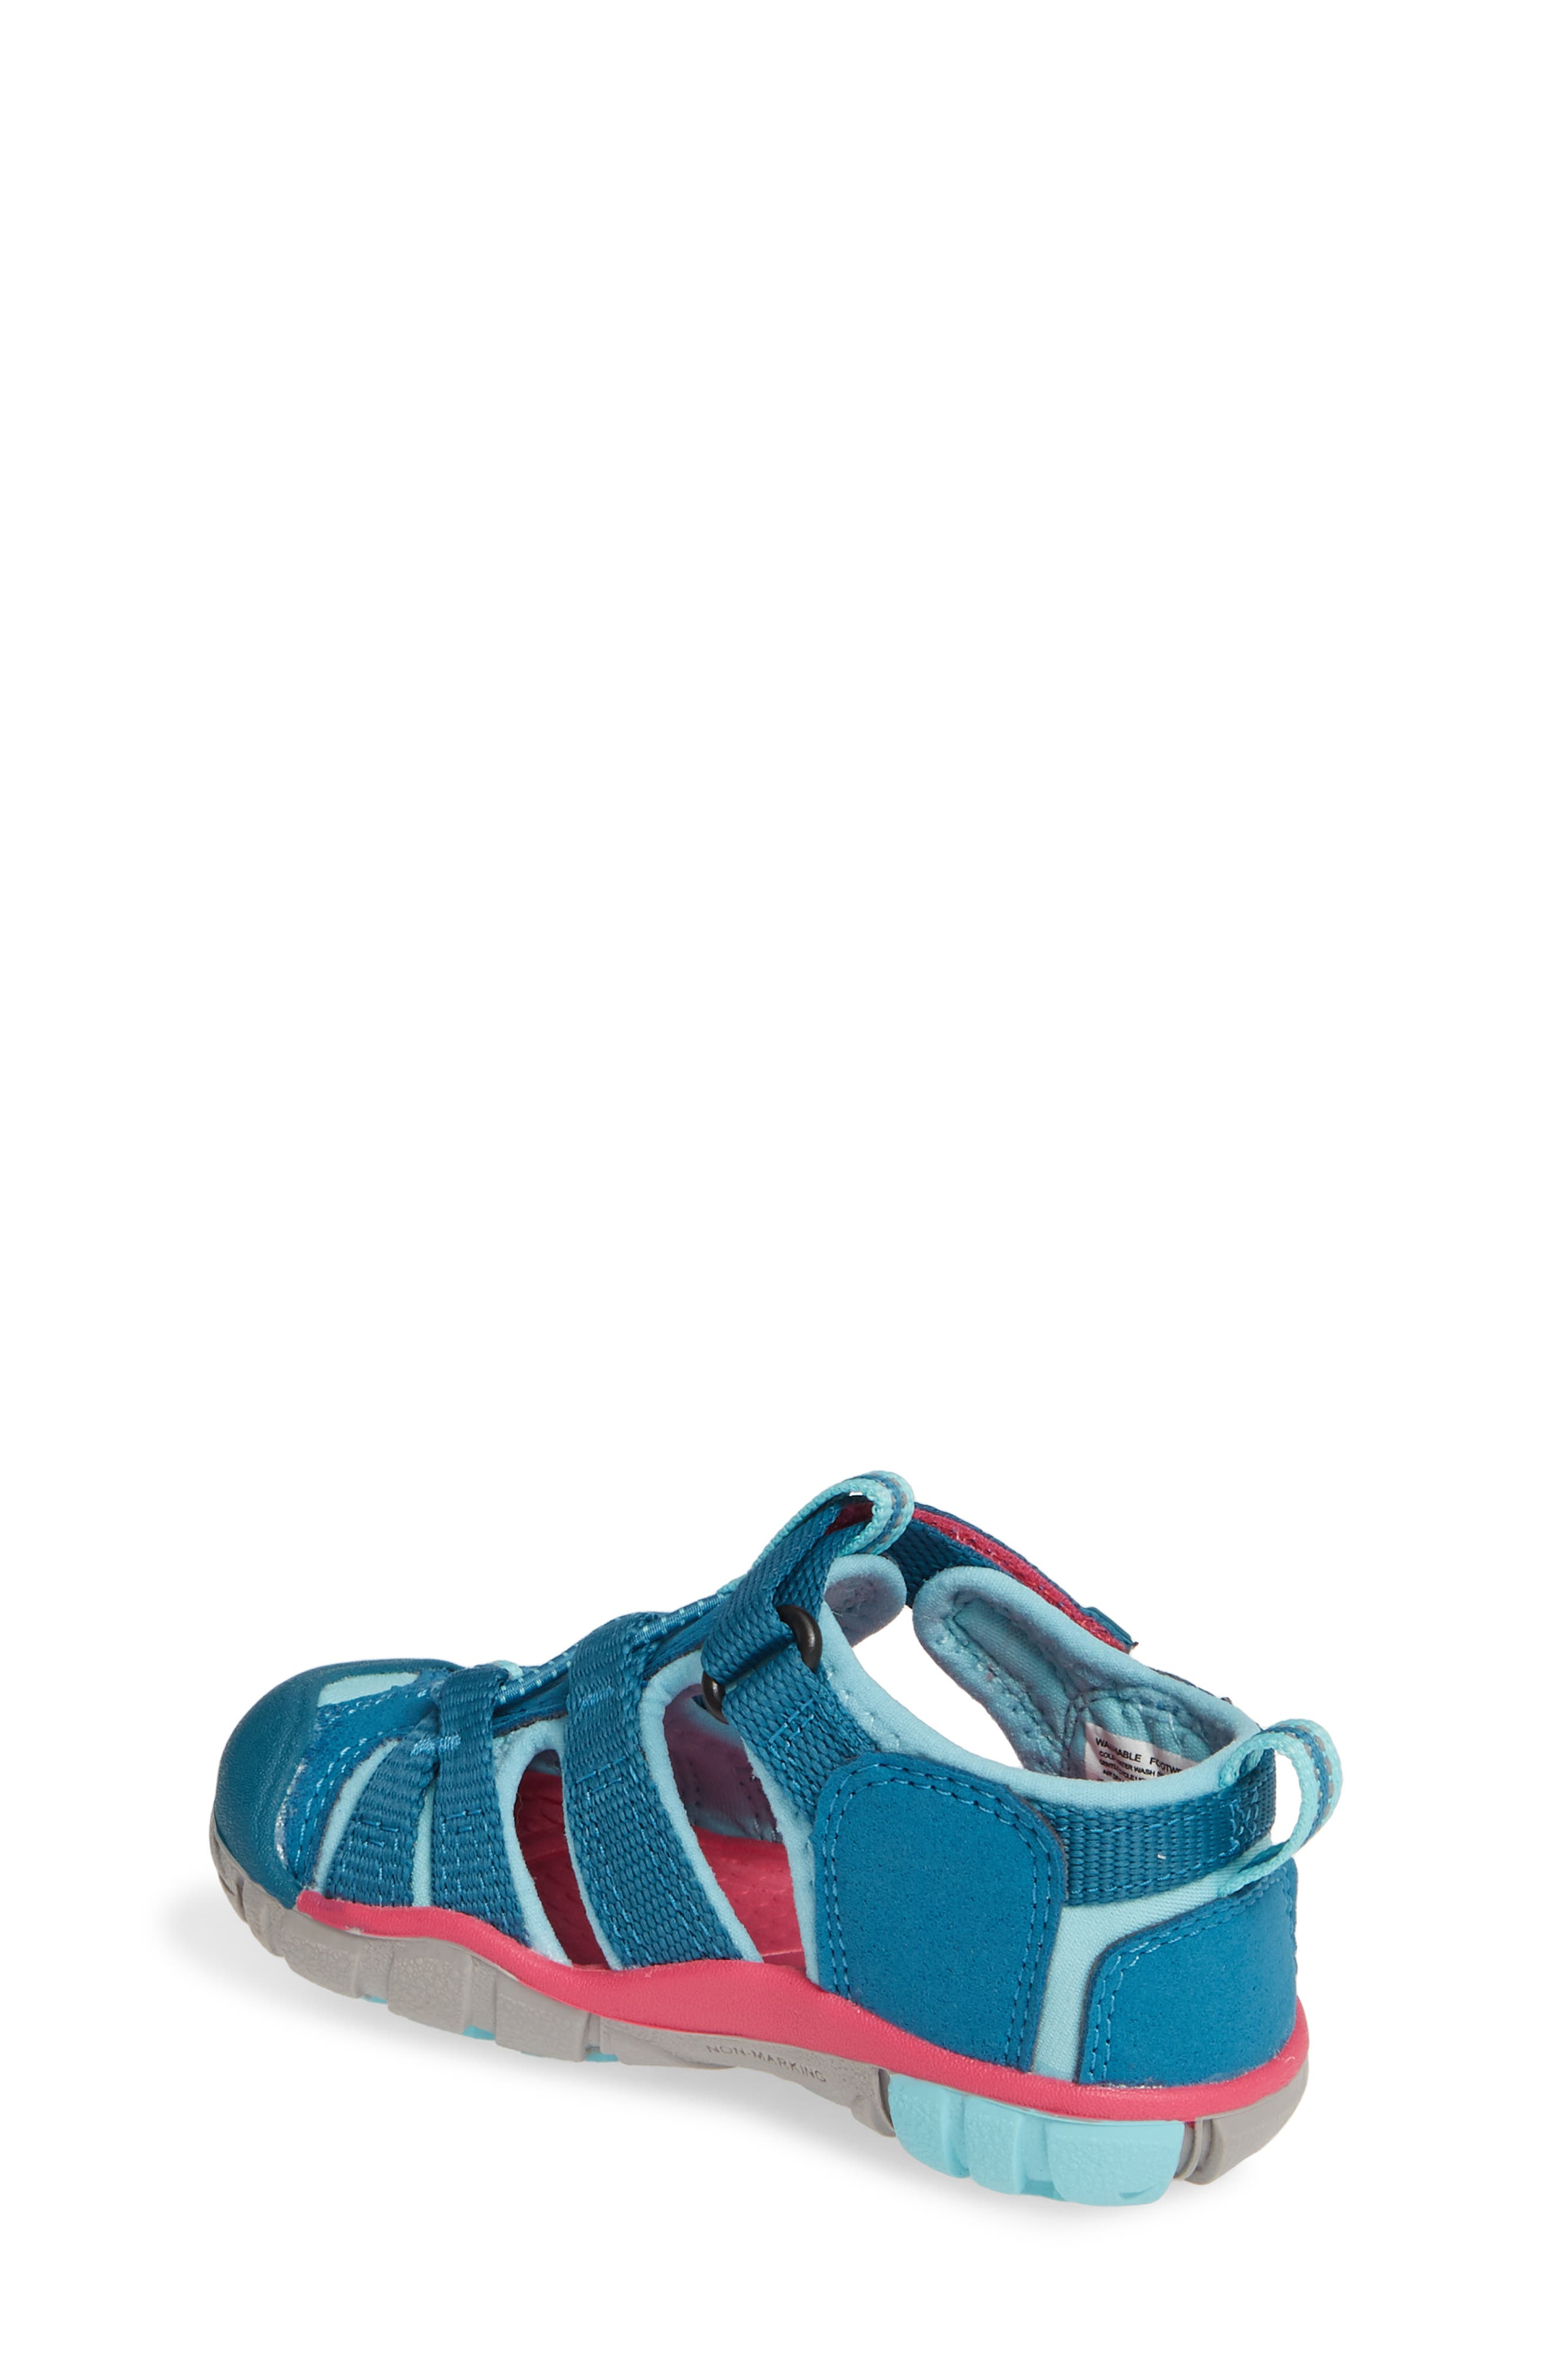 ,                             'Seacamp II' Water Friendly Sandal,                             Alternate thumbnail 52, color,                             448